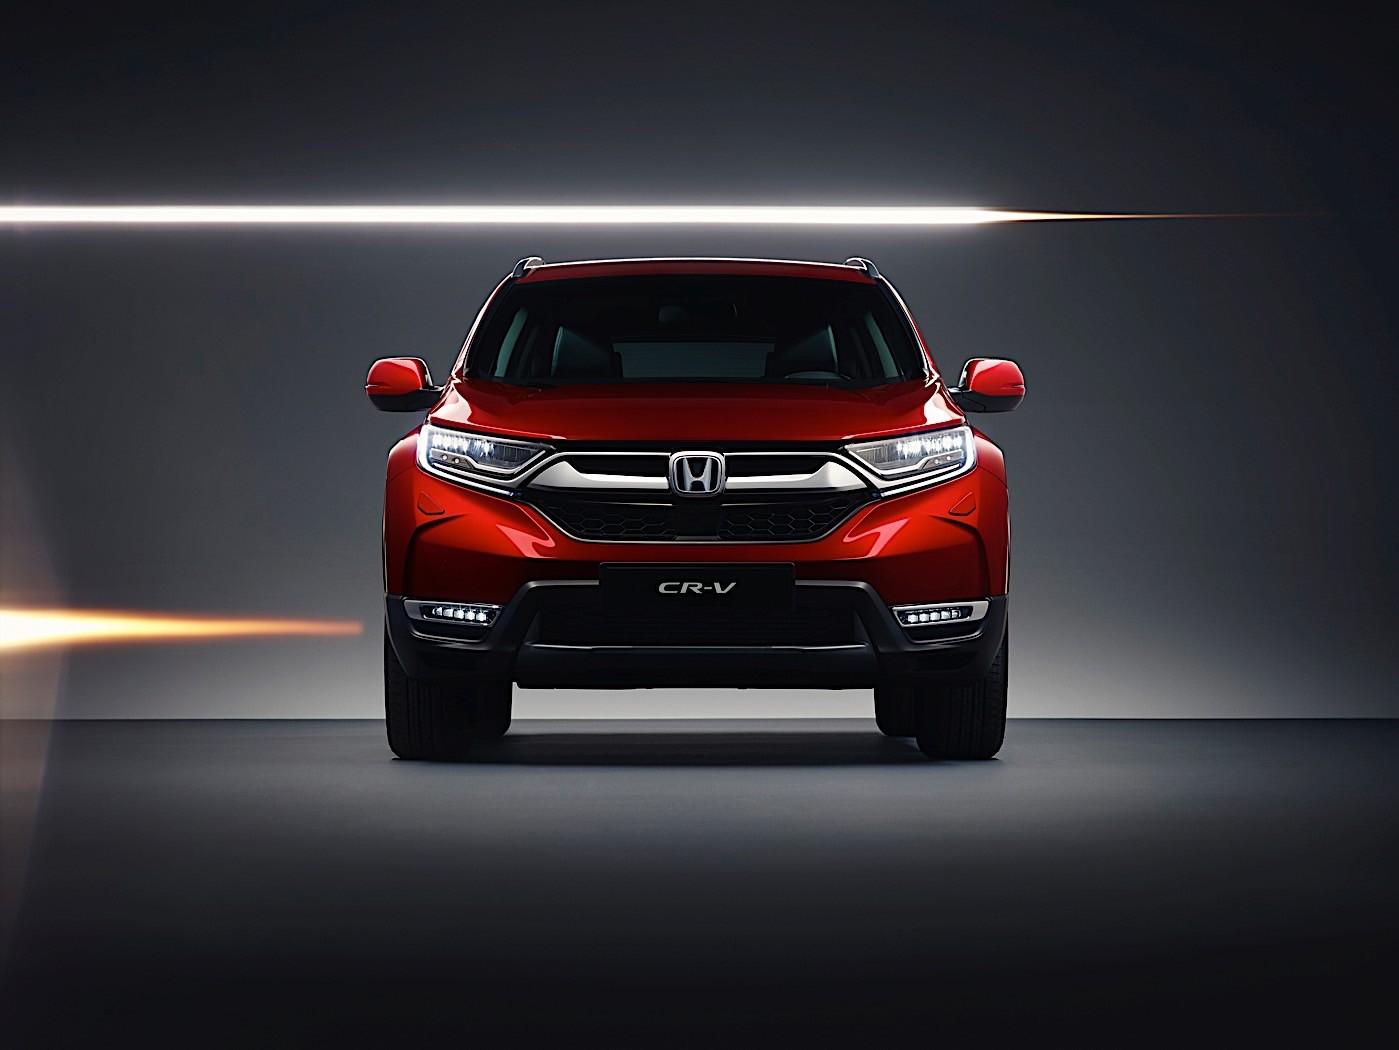 Honda CR-V 1 5 VTEC Turbo Suspected Of Engine Problem - autoevolution